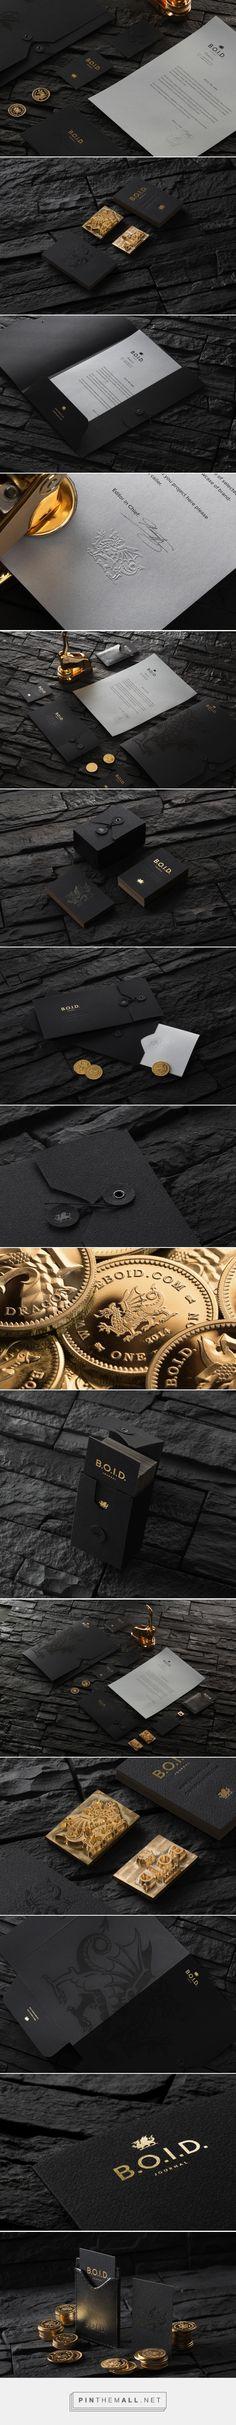 B.O.I.D. Online Journal Branding by Eskimo Design   Fivestar Branding Agency – Design and Branding Agency & Inspiration Gallery